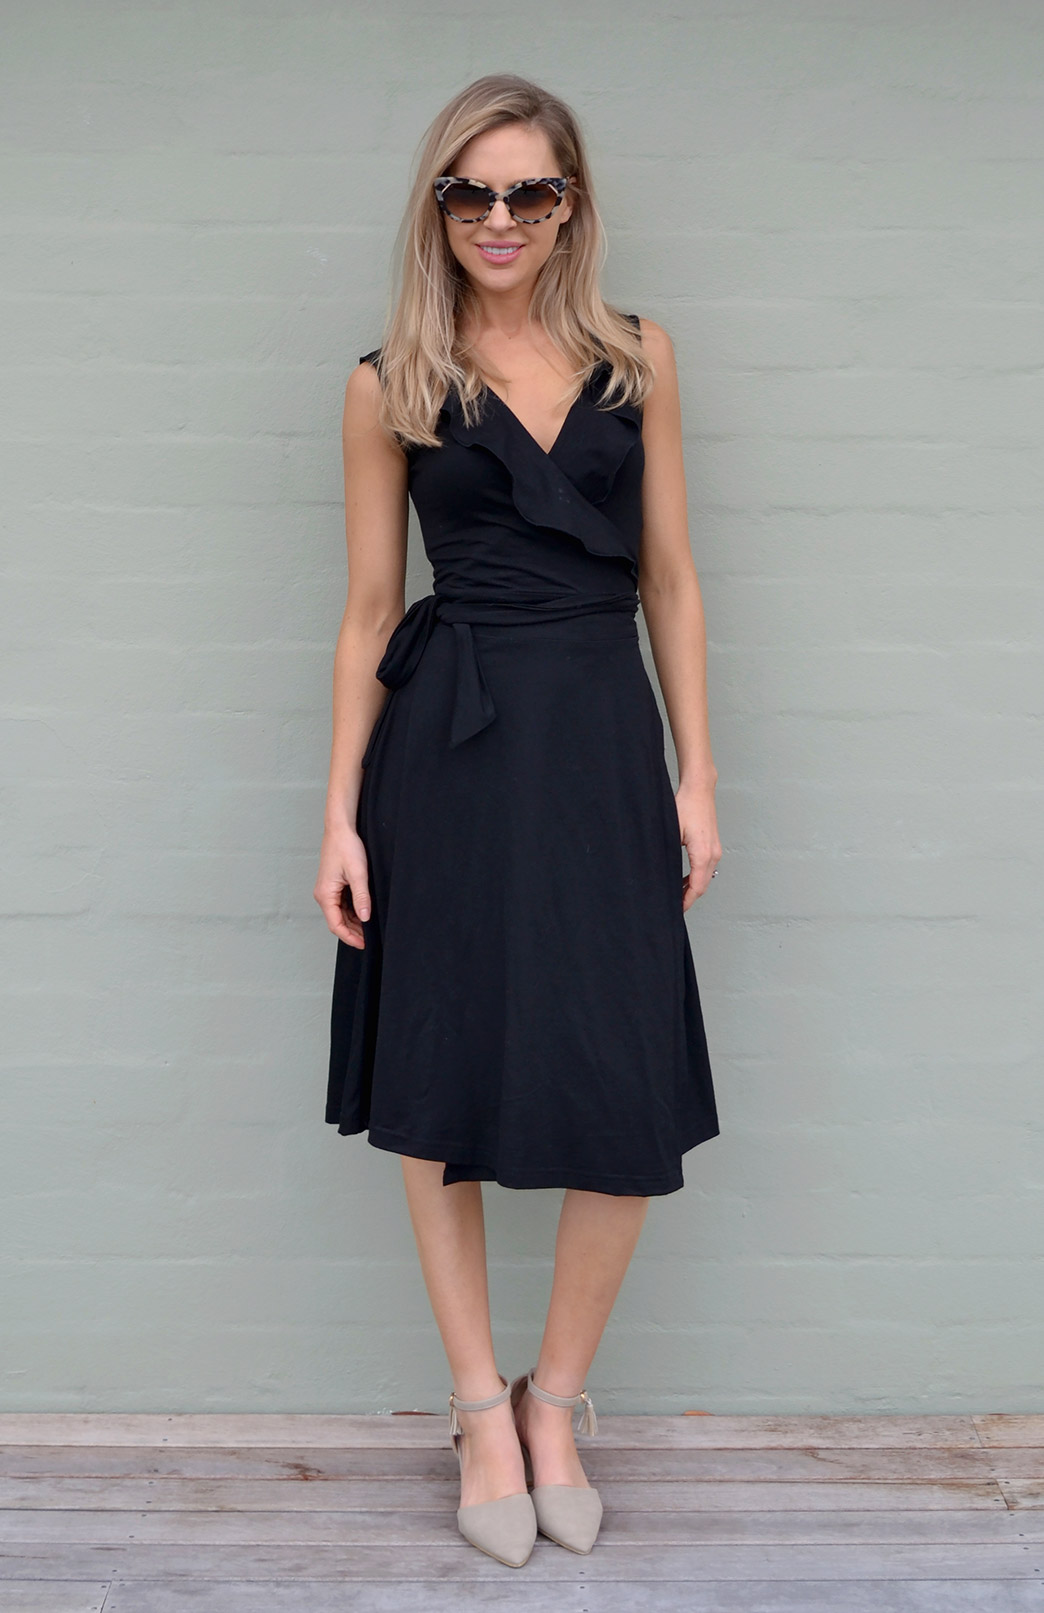 Ophelia Wrap Dress - Women's Summer Sleeveless Black Merino Wool Wrap Dress with Ruffled Collar - Smitten Merino Tasmania Australia